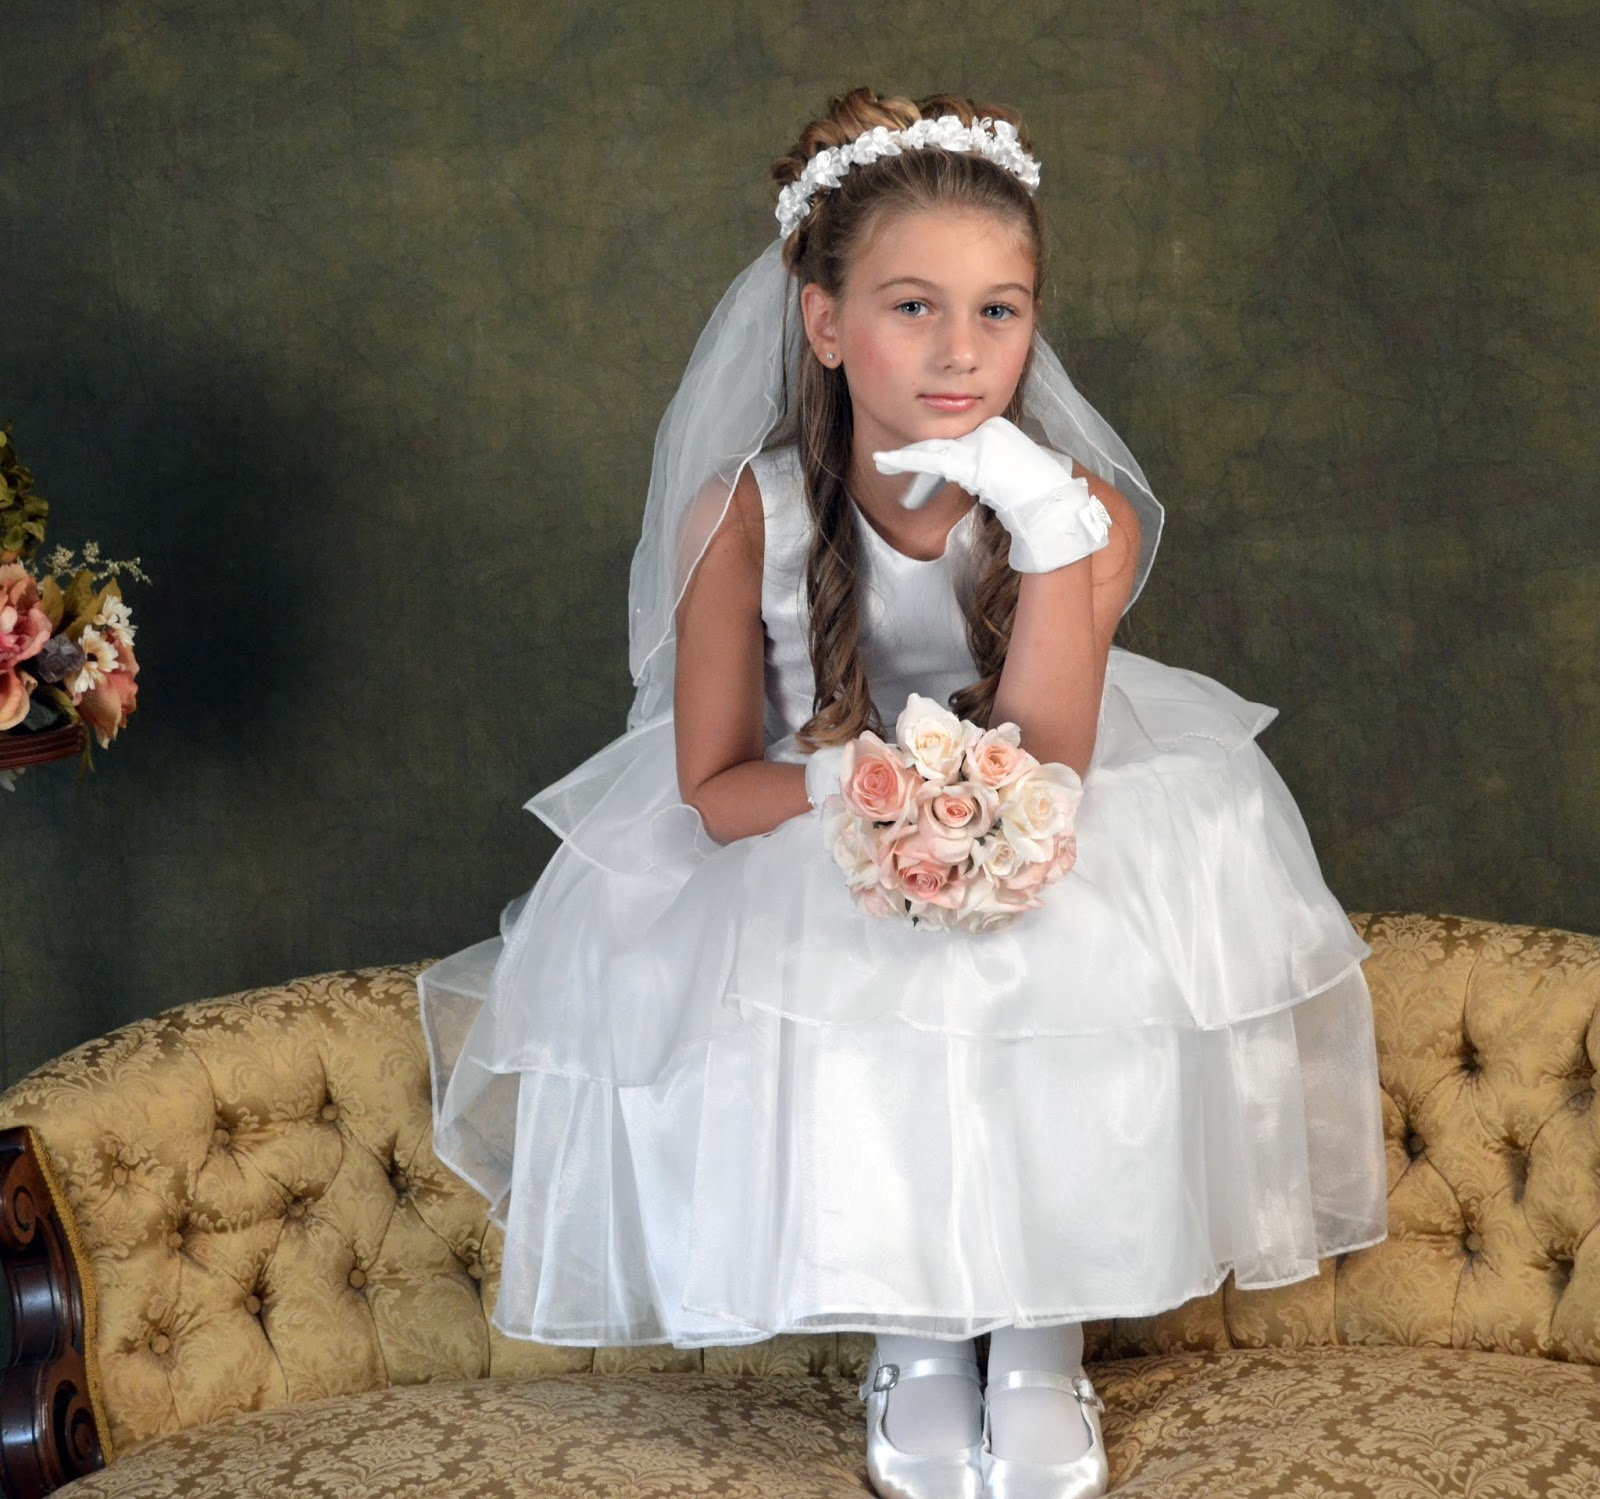 first-communion-dresses100.jpg